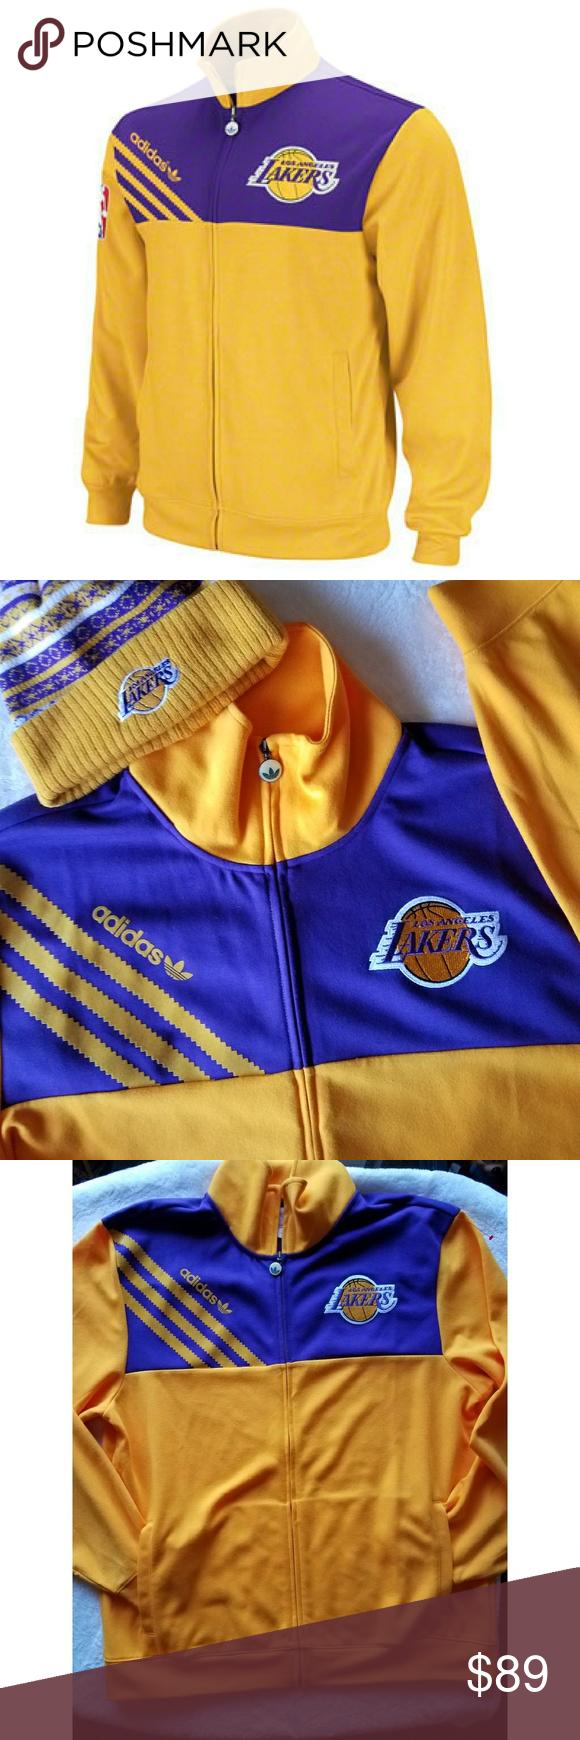 Picks JacketMy Posh Pinterest Adidas Lakers Track Nba 6gybf7Y